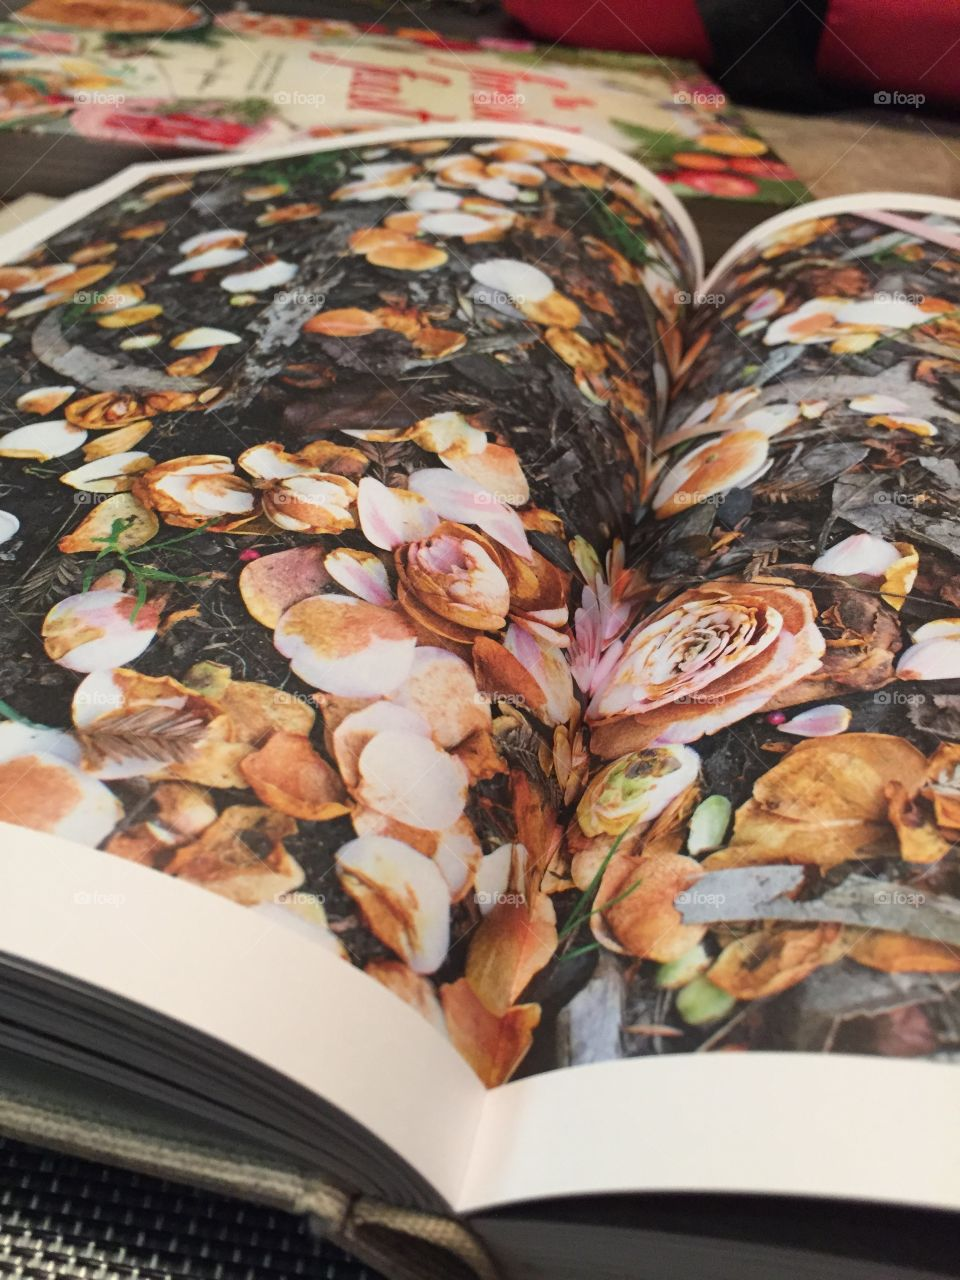 Coffee books && flowers